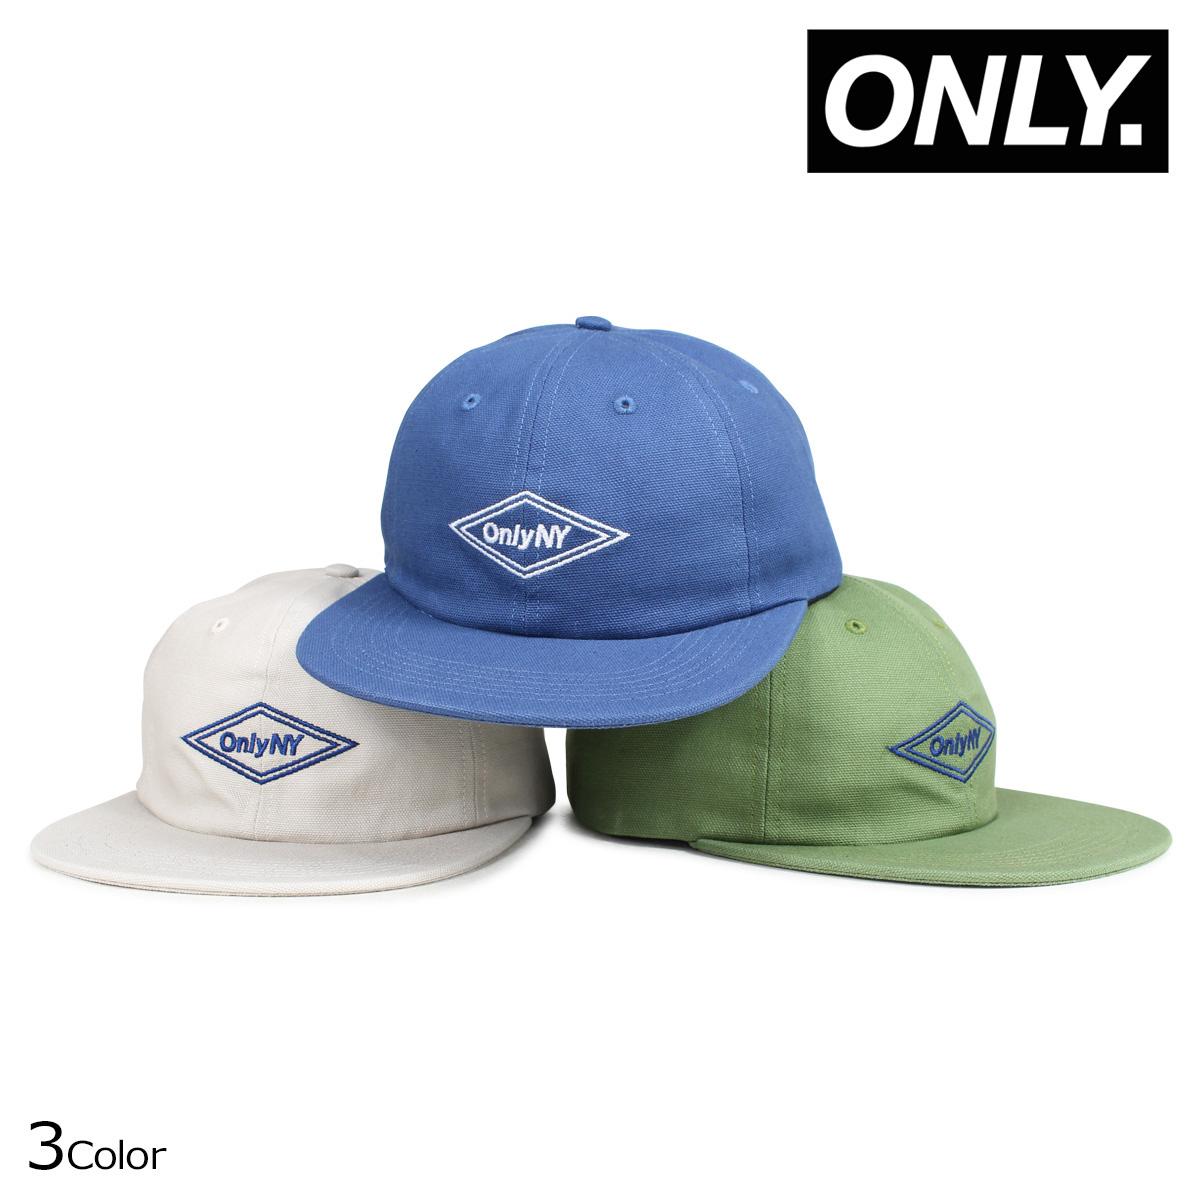 0dc7ff77327 ONLY NY DIAMOND POLO HAT オンリーニューヨーク キャップ 帽子 メンズ レディース ホワイト ブルー グリーン  5 31  新入荷  低価格で大人気